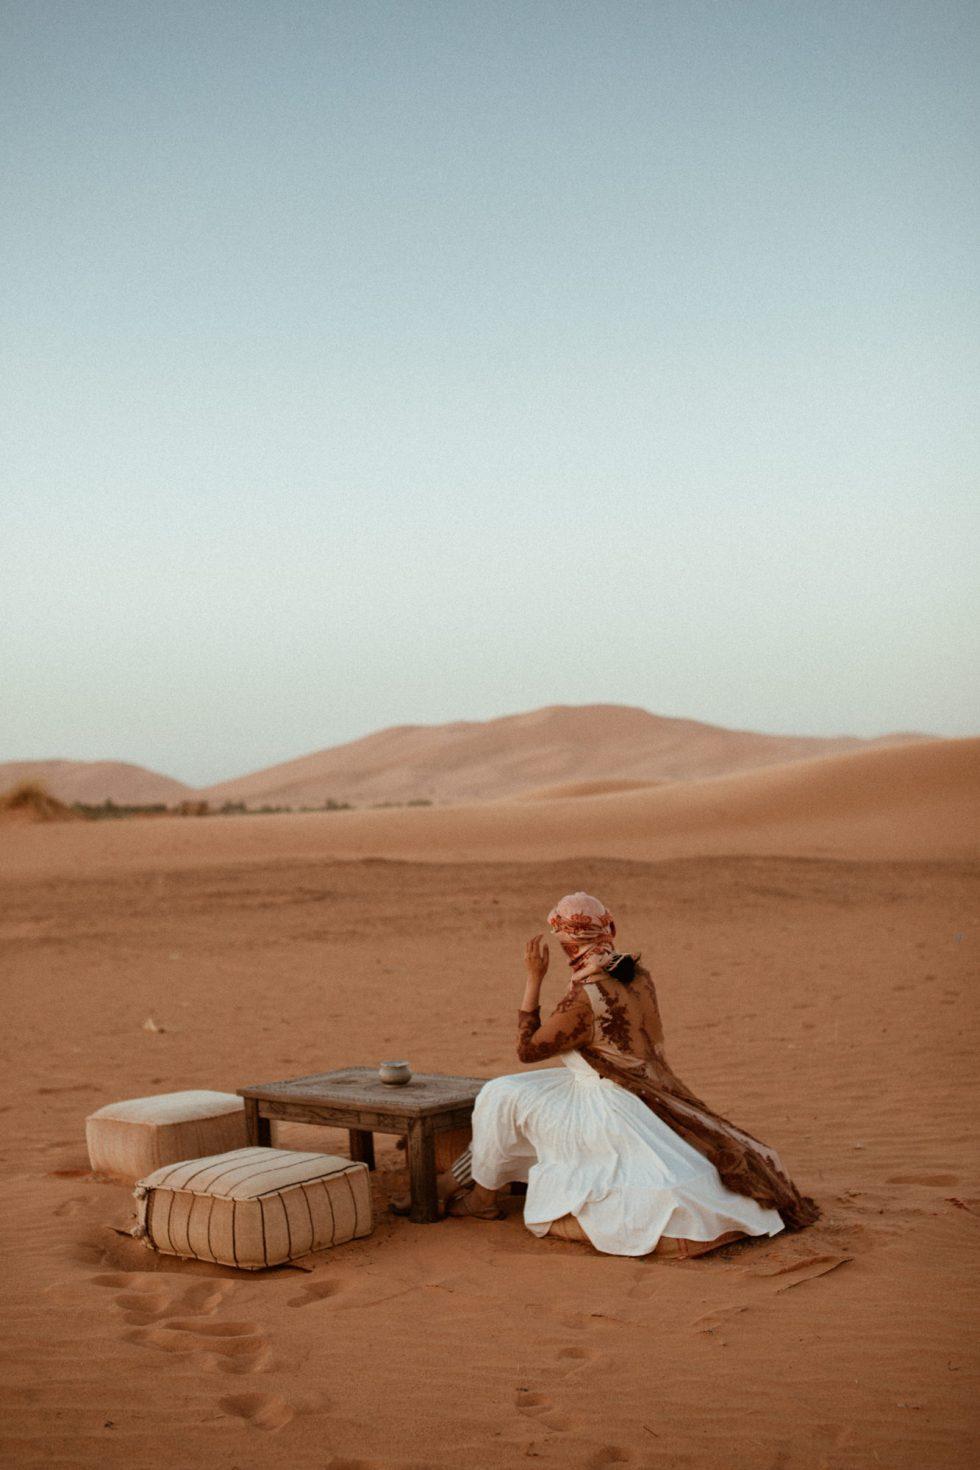 desert-morocco-travel-lifestyle-photographer-laura-g-diaz